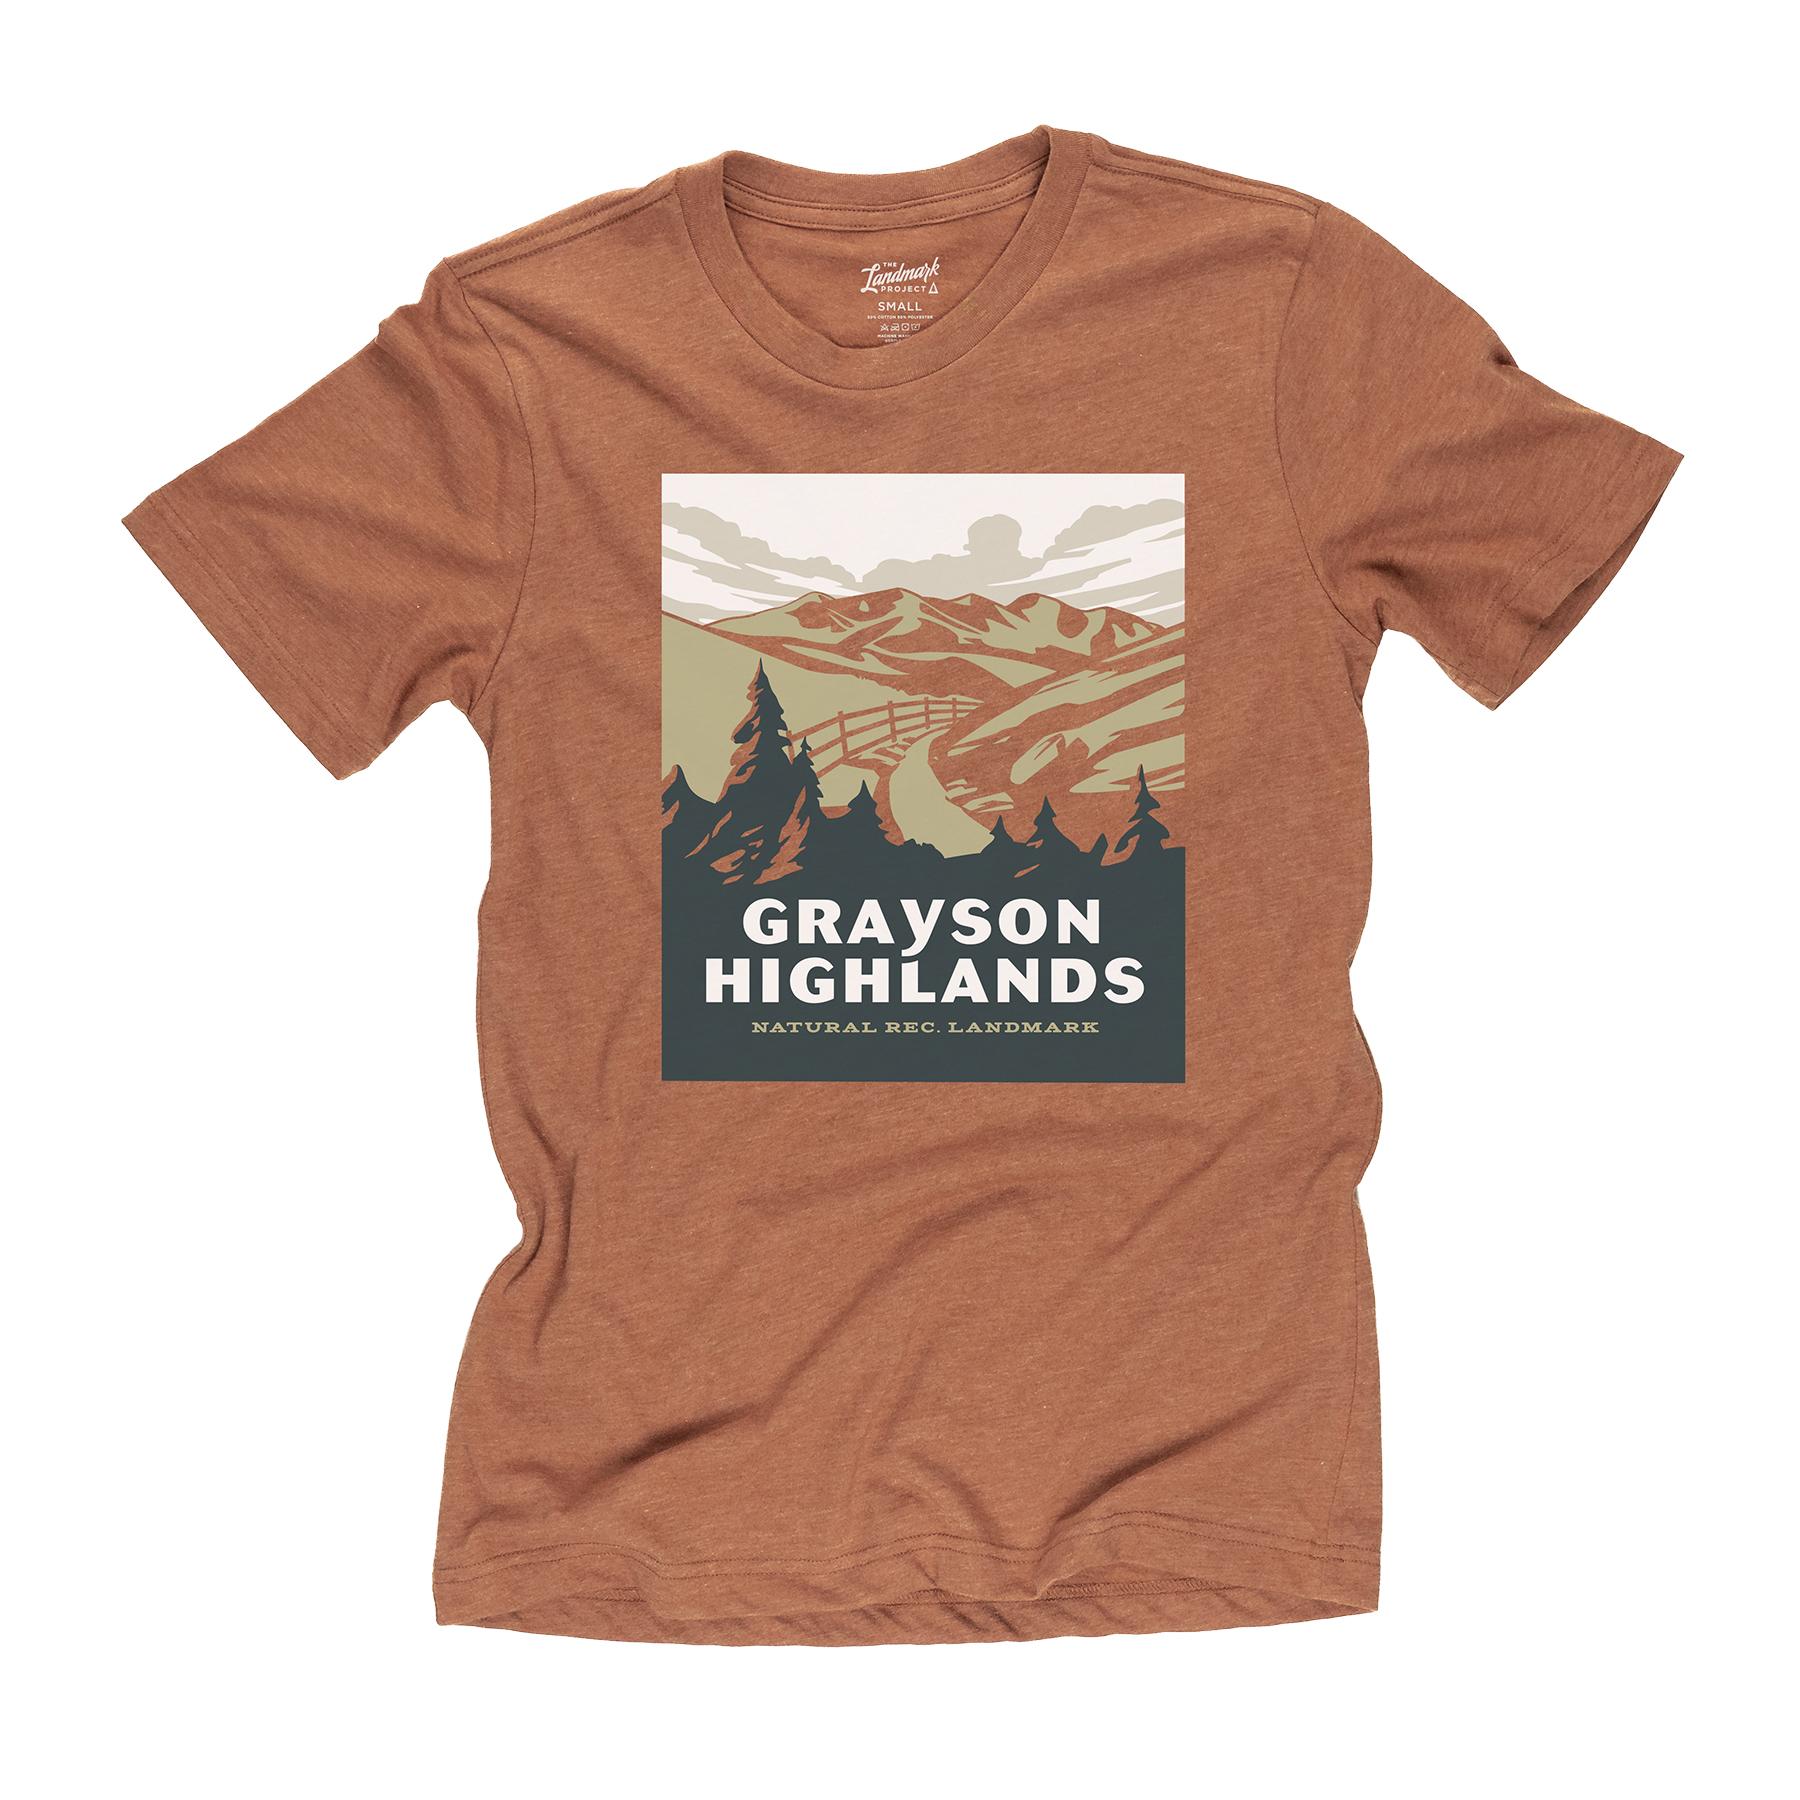 grayson-highlands-tee .jpg